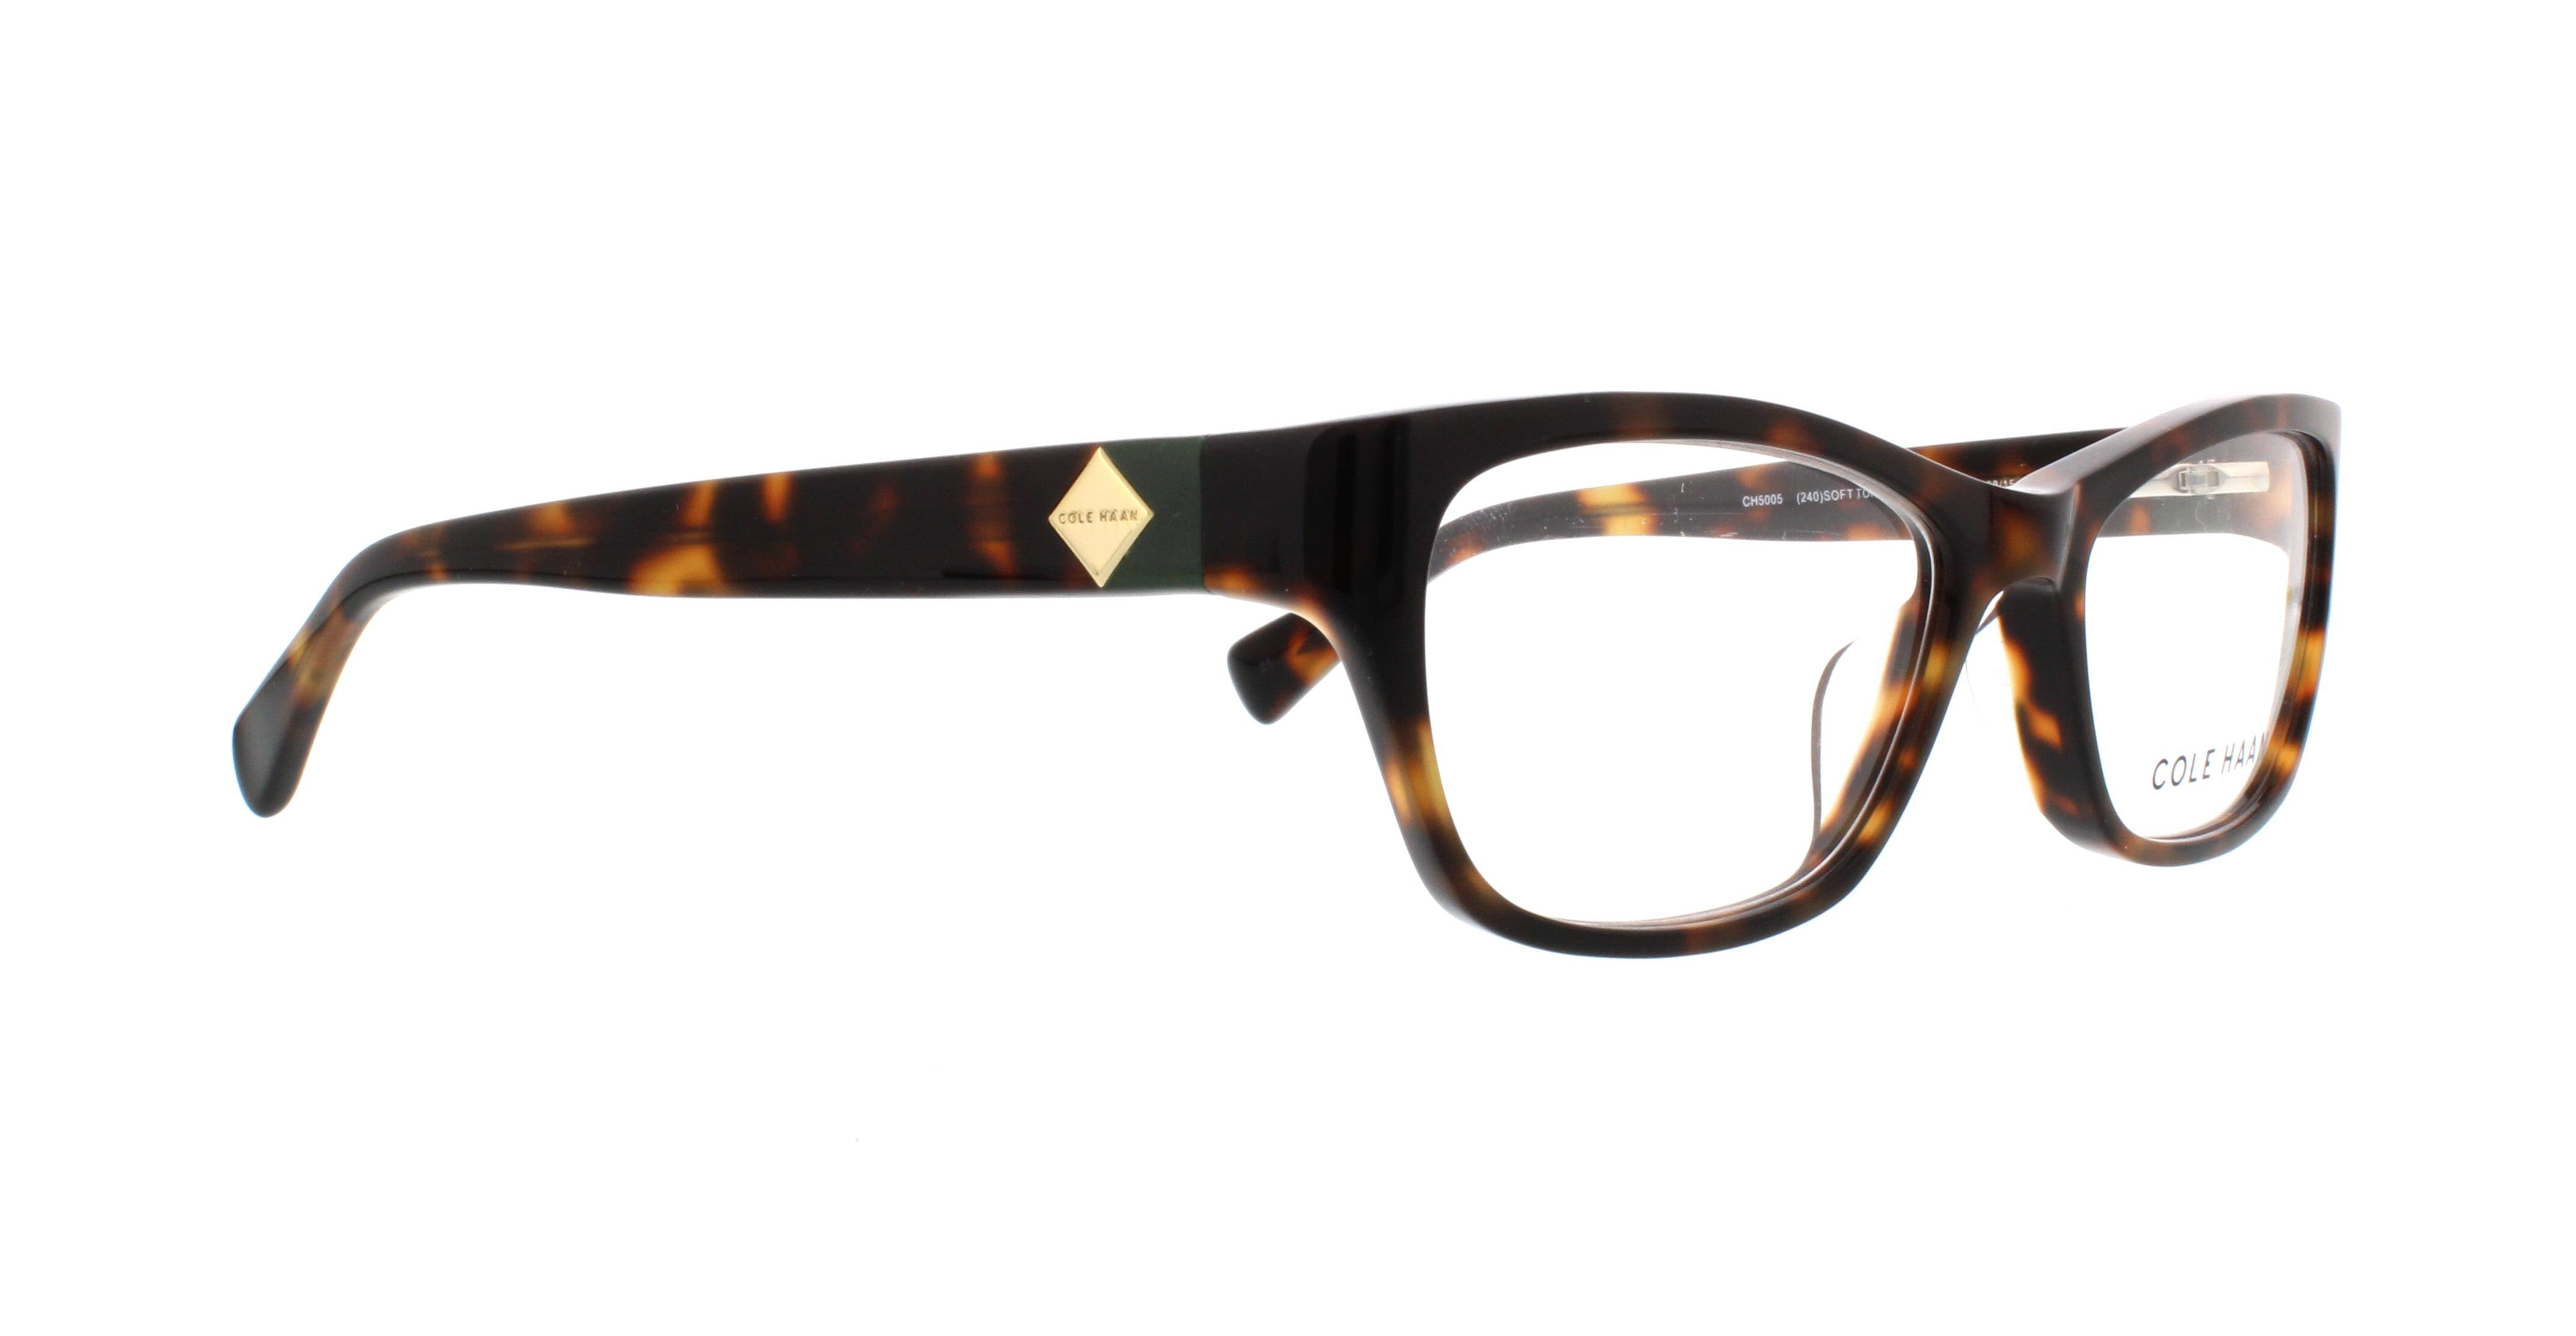 COLE HAAN Eyeglasses CH5005 240 Soft Tortoise 52MM - Walmart.com